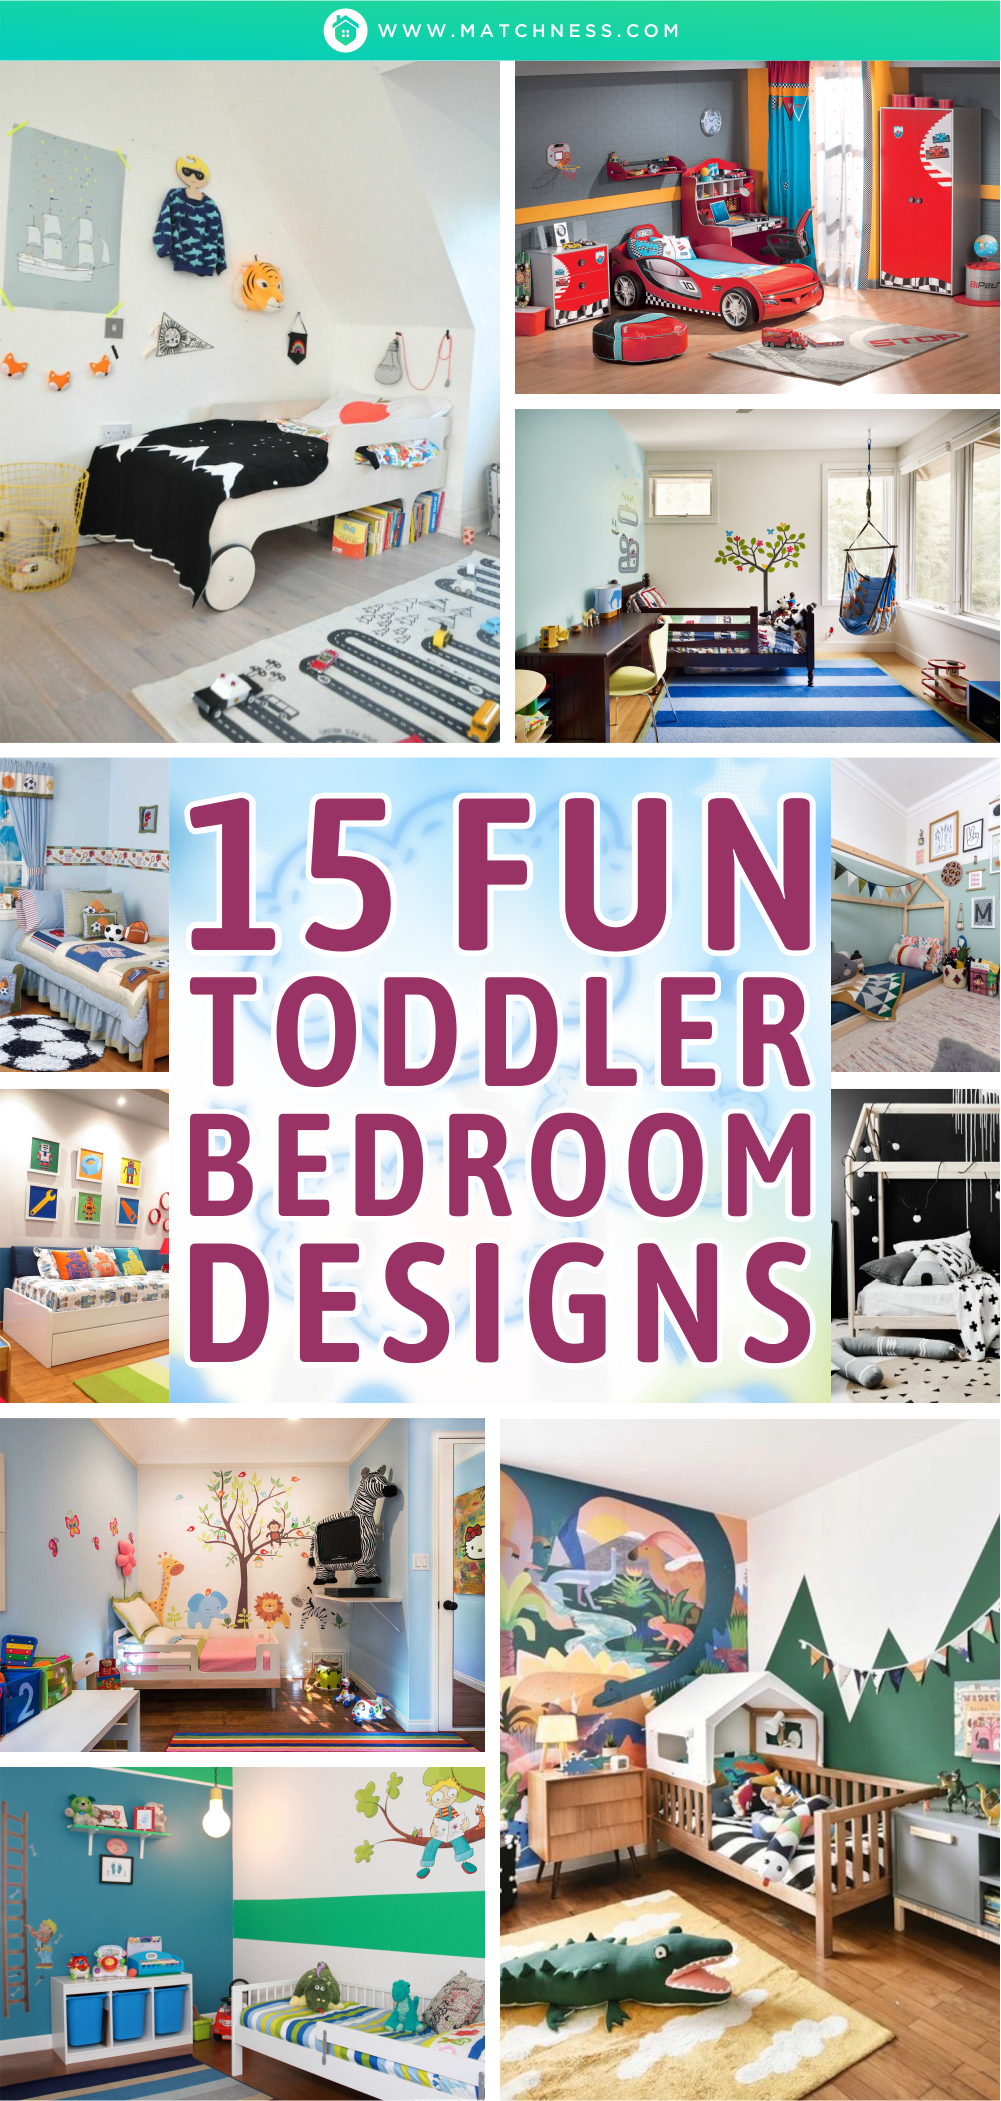 15 fun toddler bedroom designs1